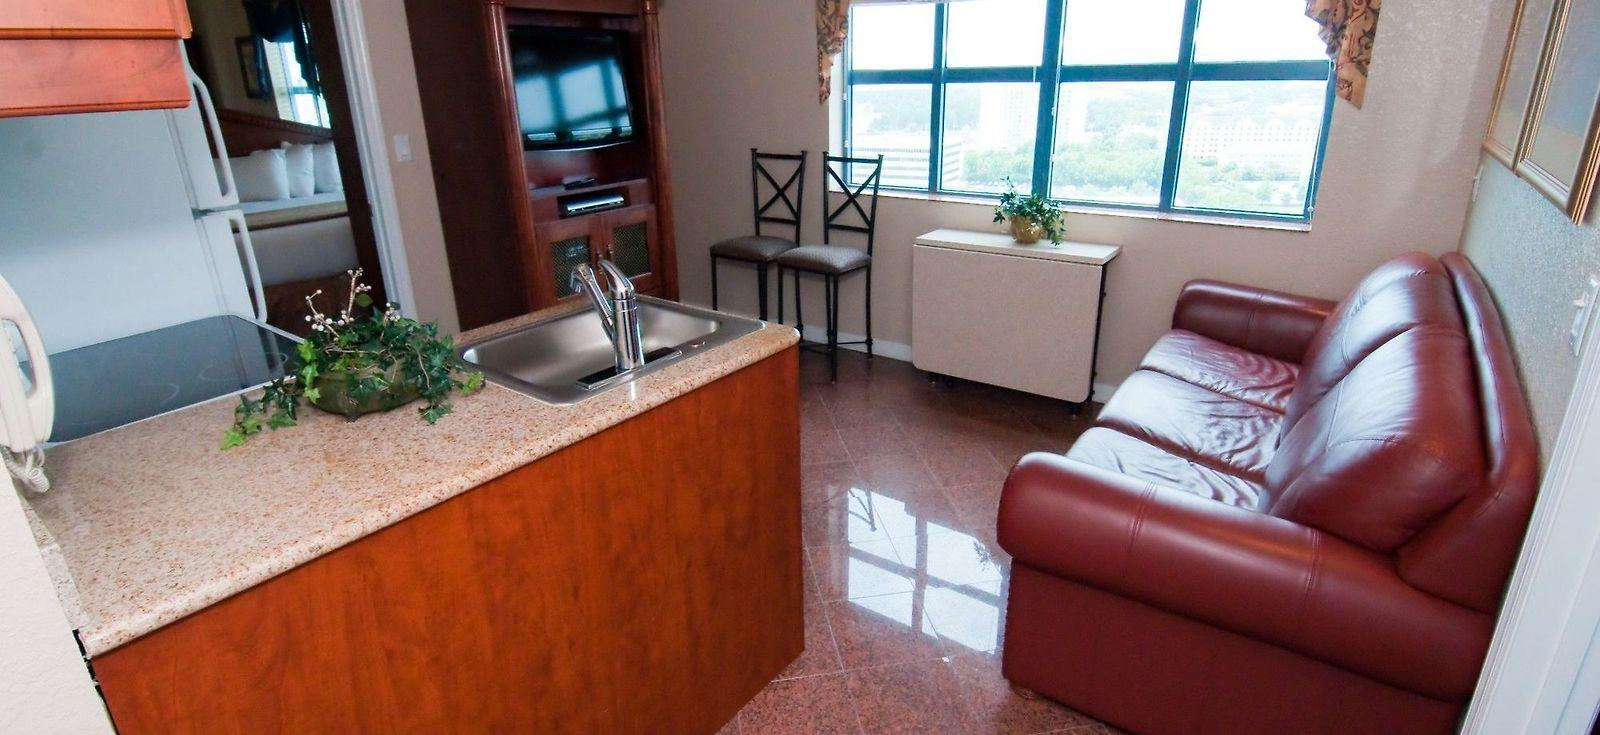 WESTGATE PALACE RESORT ORLANDO - Westgate palace 2 bedroom suite